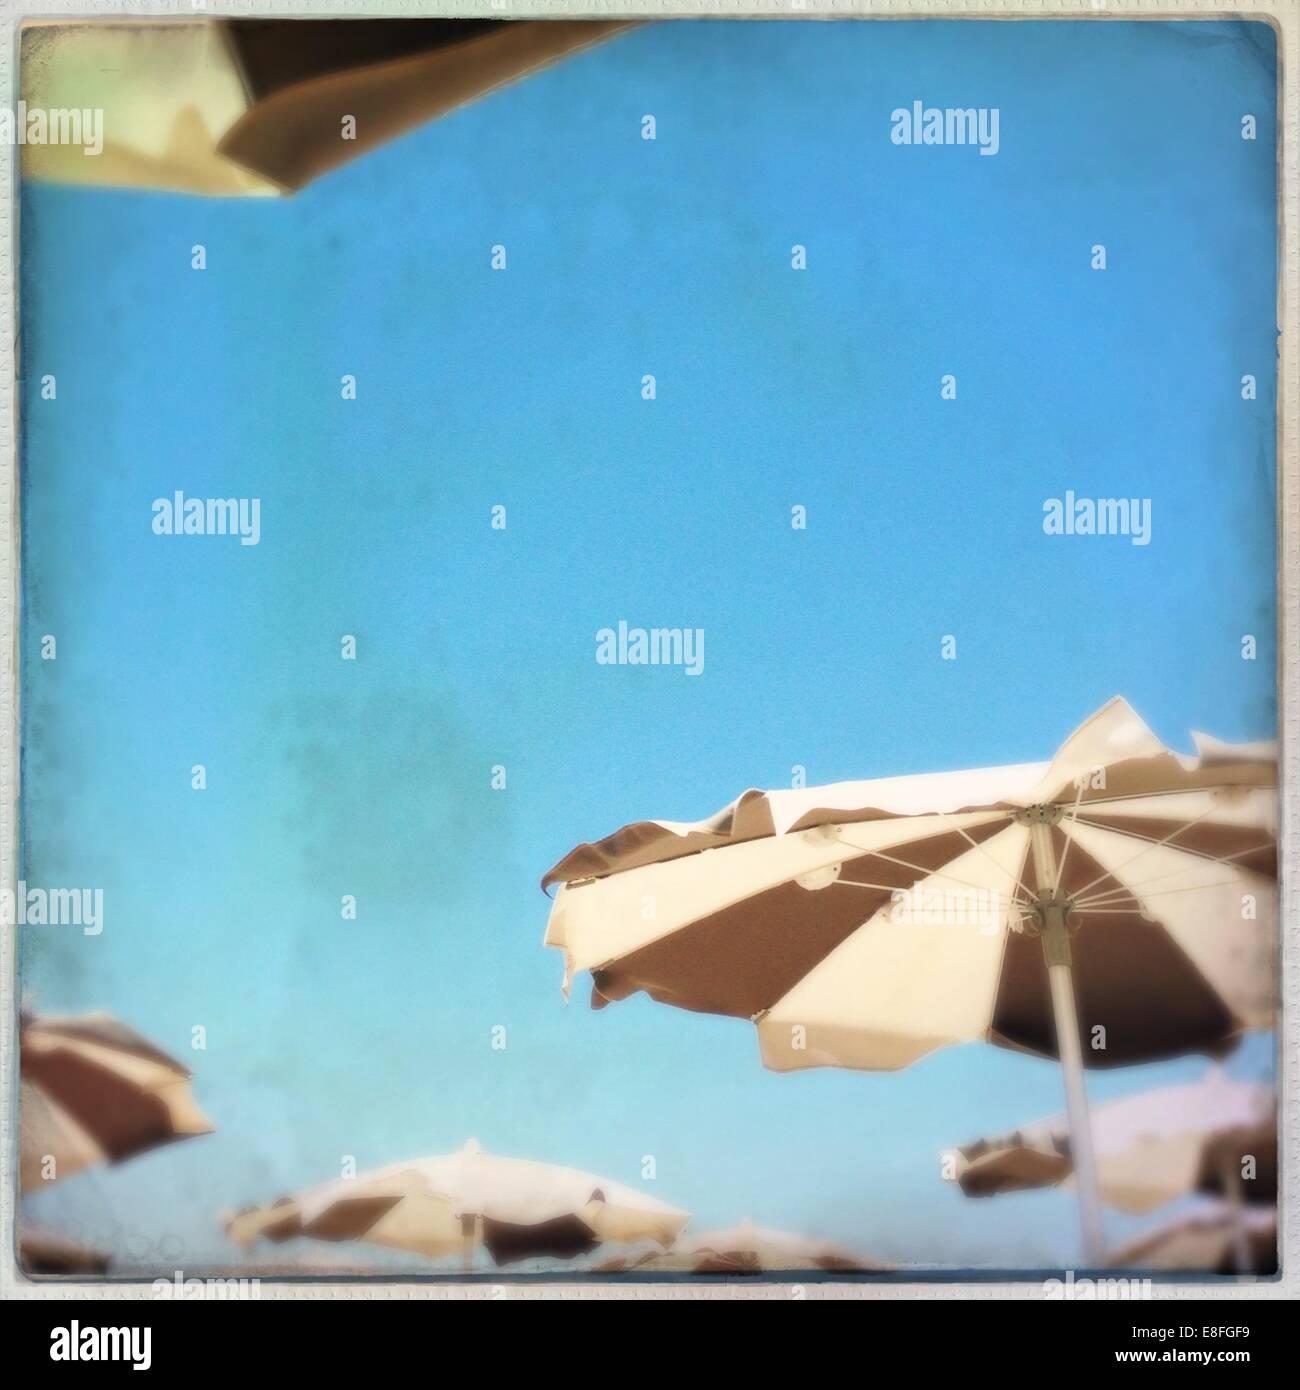 Blue sky at beach and beach umbrellas - Stock Image